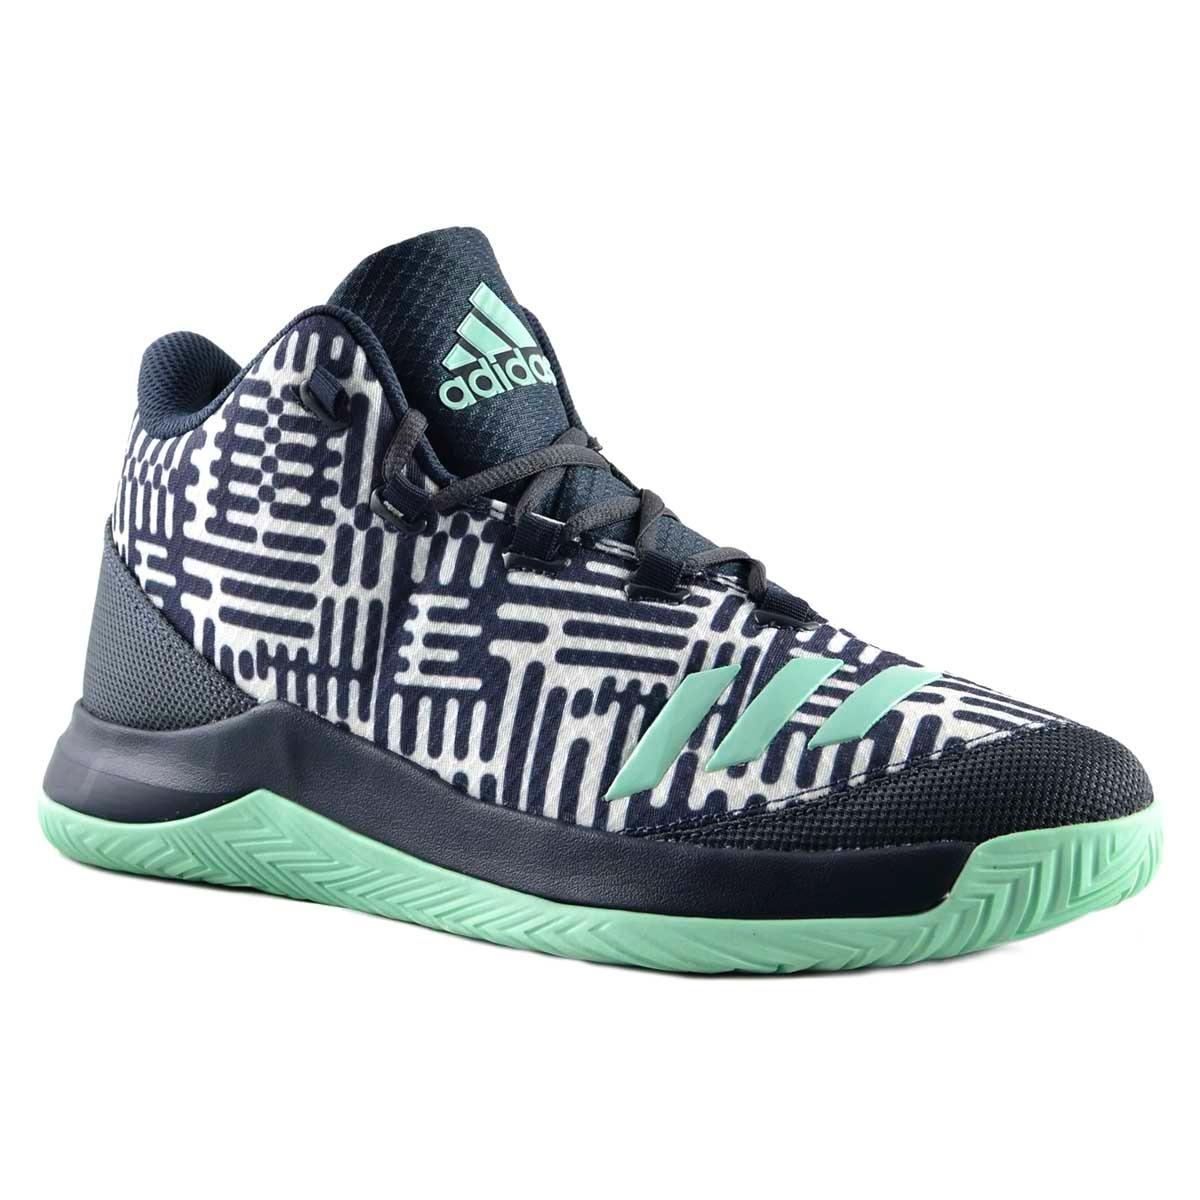 adidas argentina zapatillas basquet